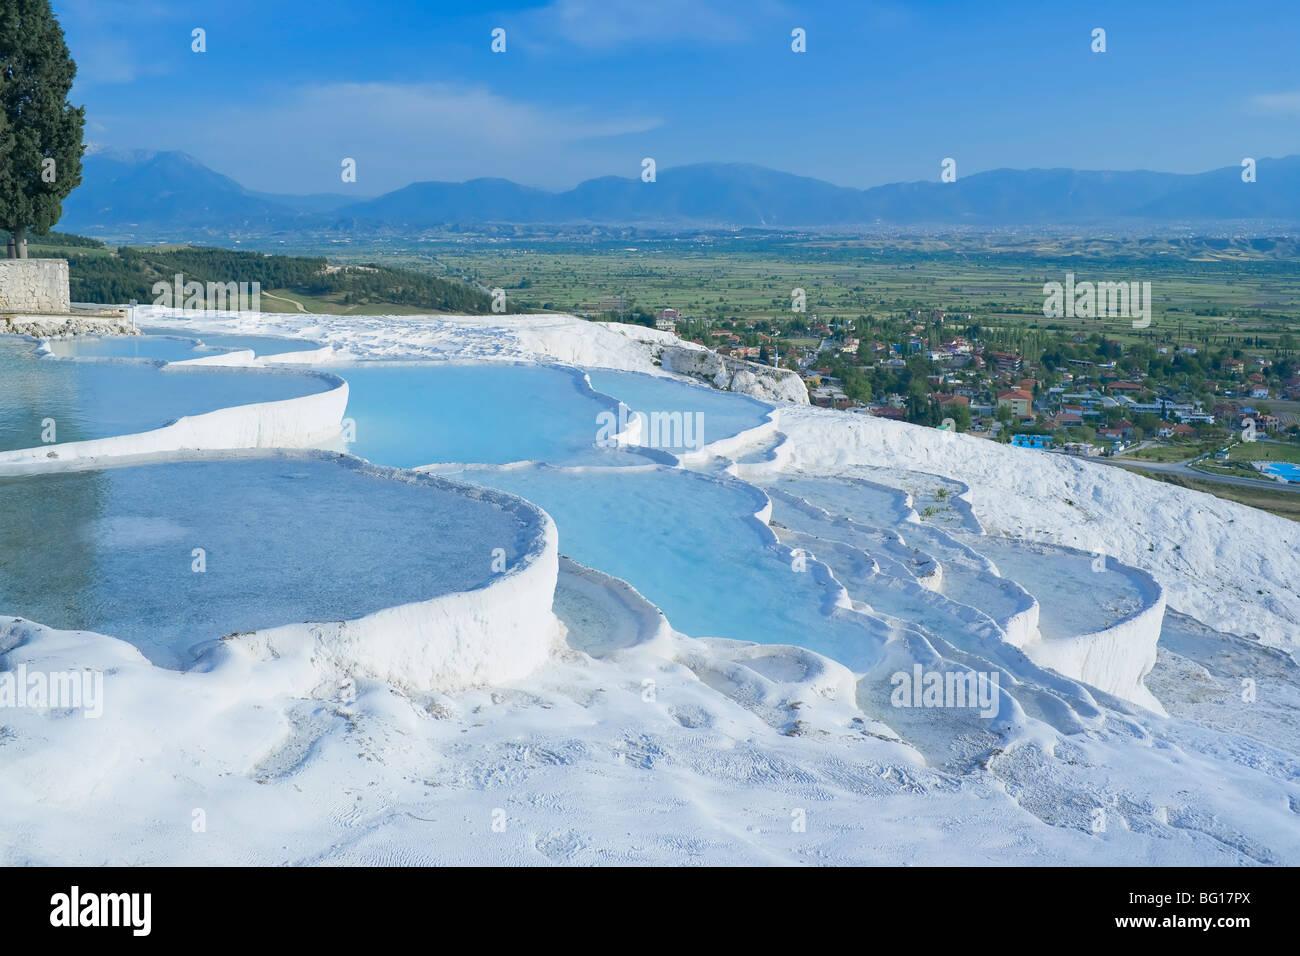 Terraced travertine thermal pools, Pamukkale, UNESCO World Heritage Site, Anatolia, Turkey, Asia Minor, Eurasia - Stock Image